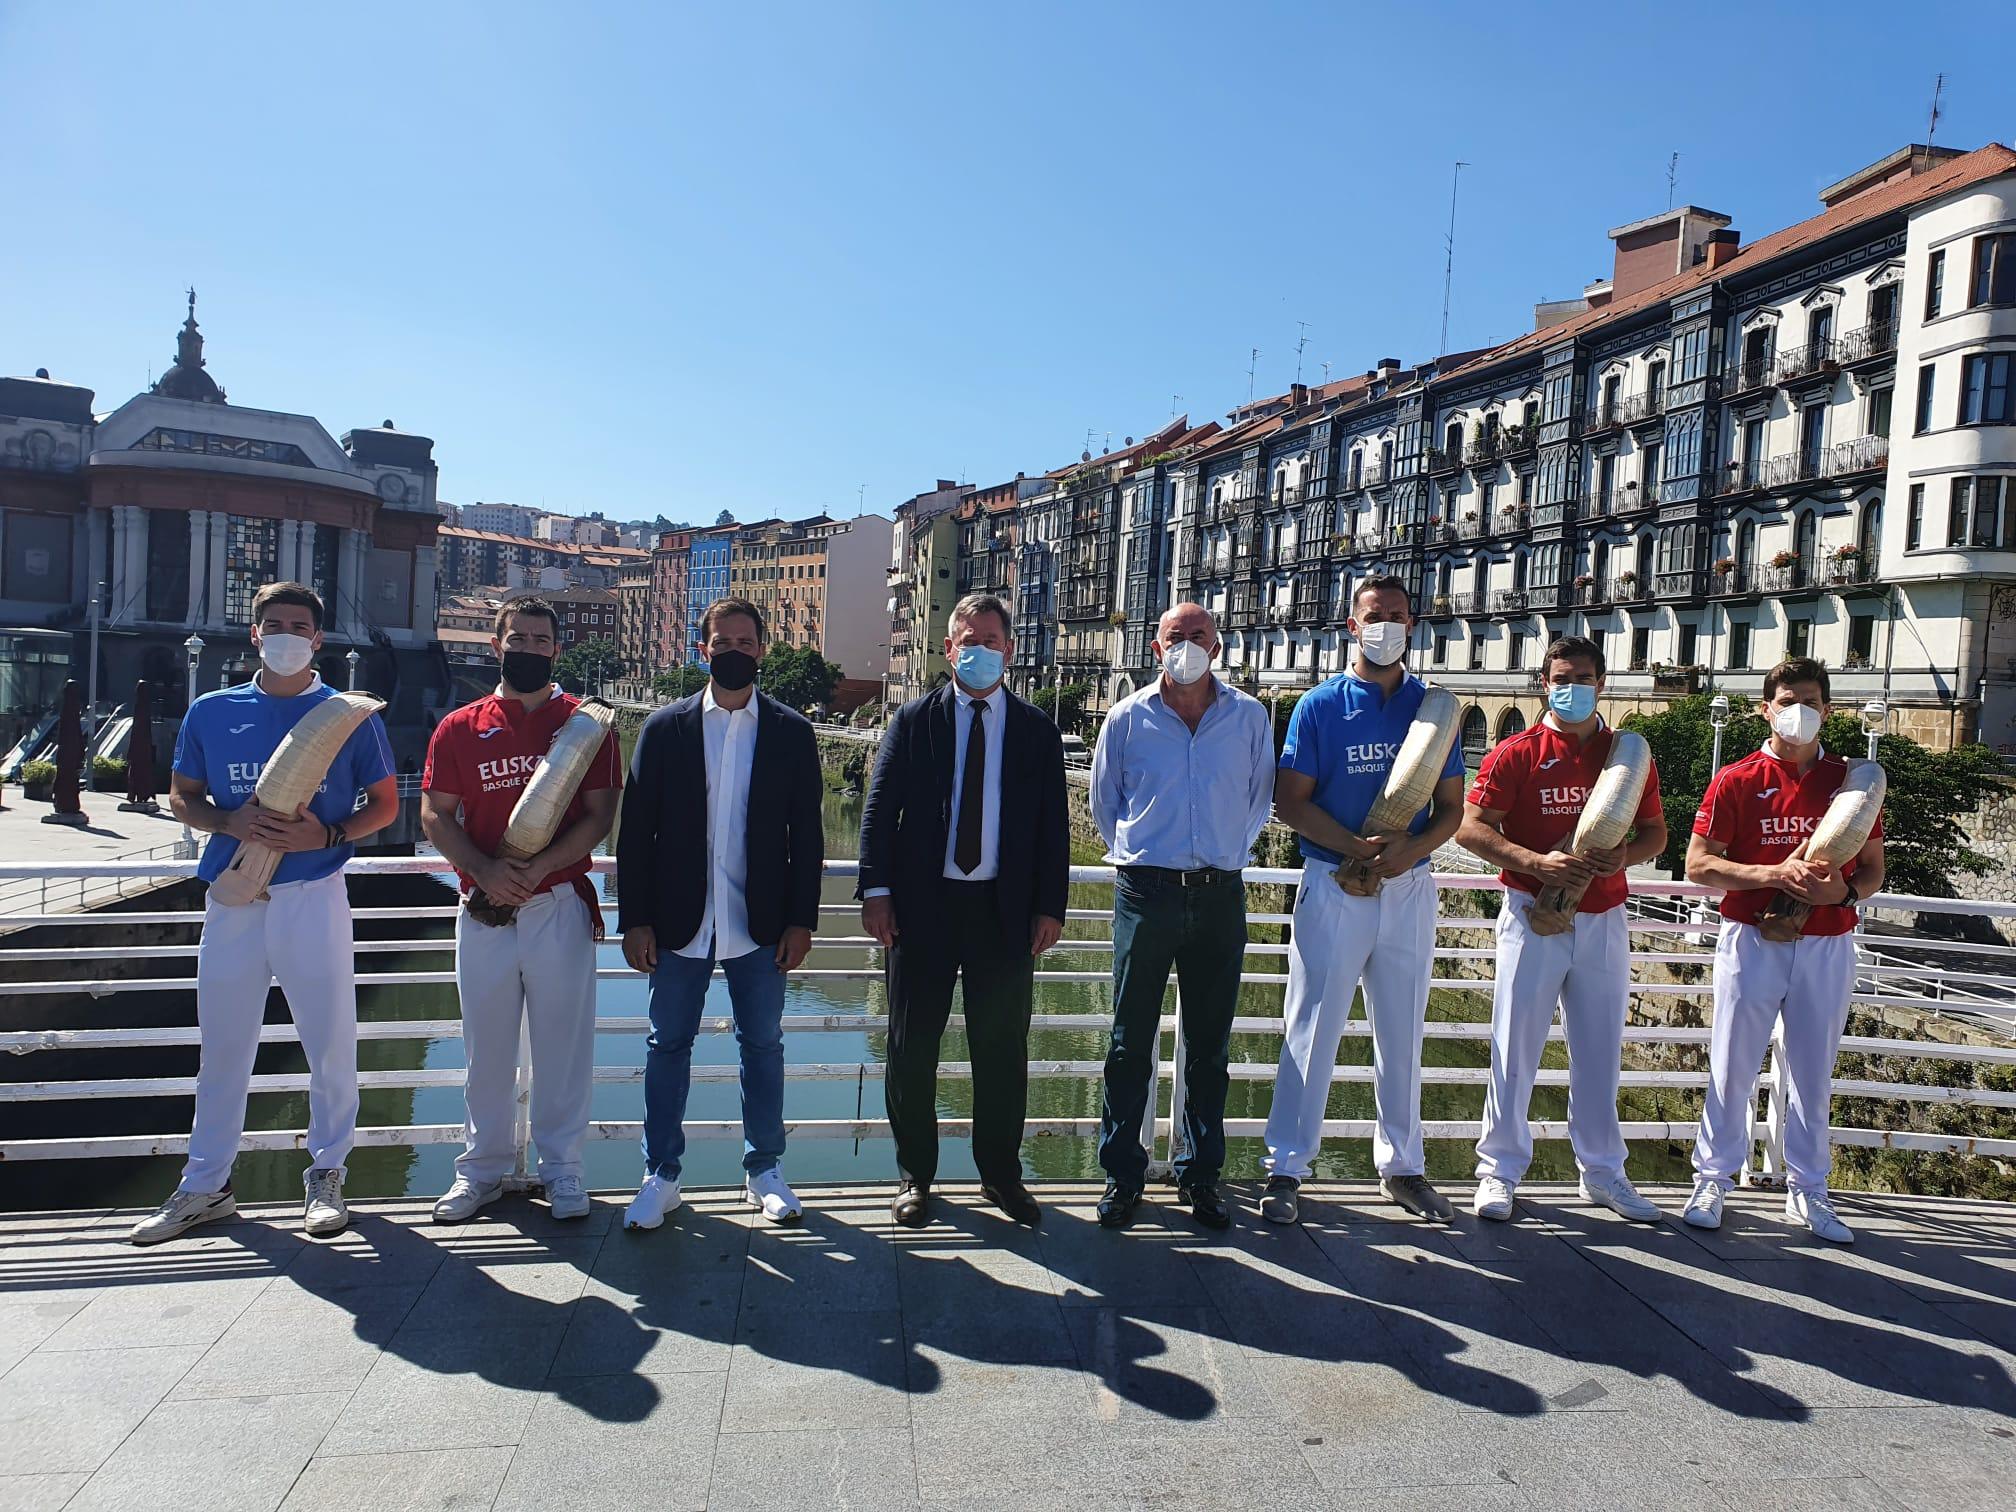 Bingen Zupiria participa en la presentación del Jai Alai World Tour de cesta punta  [13:41]